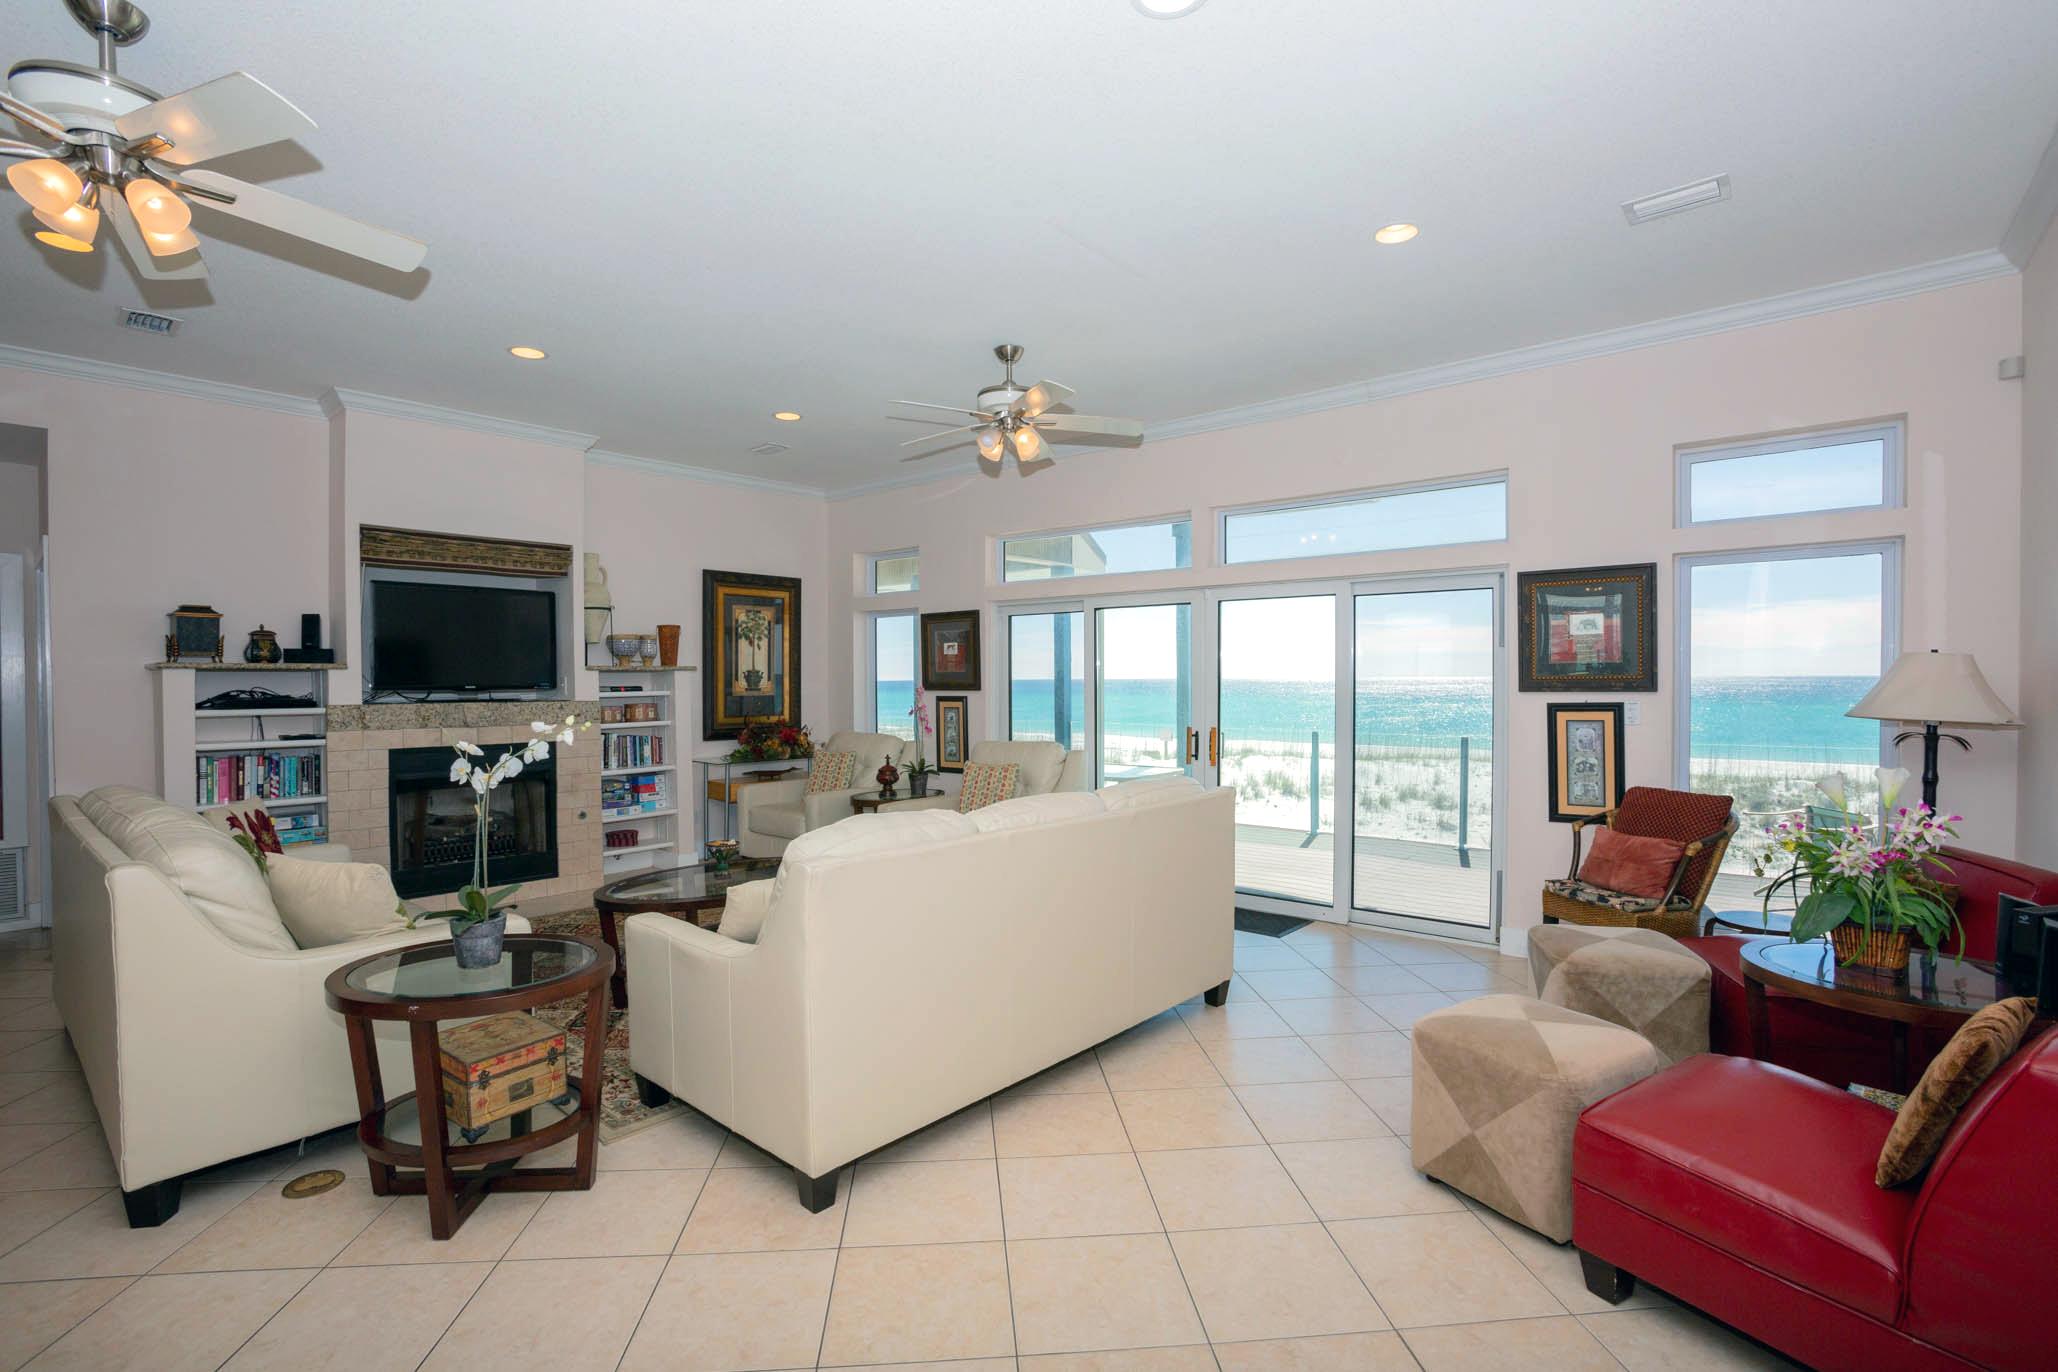 Ariola 1214 House/Cottage rental in Luxury Homes in Pensacola Beach Florida - #9